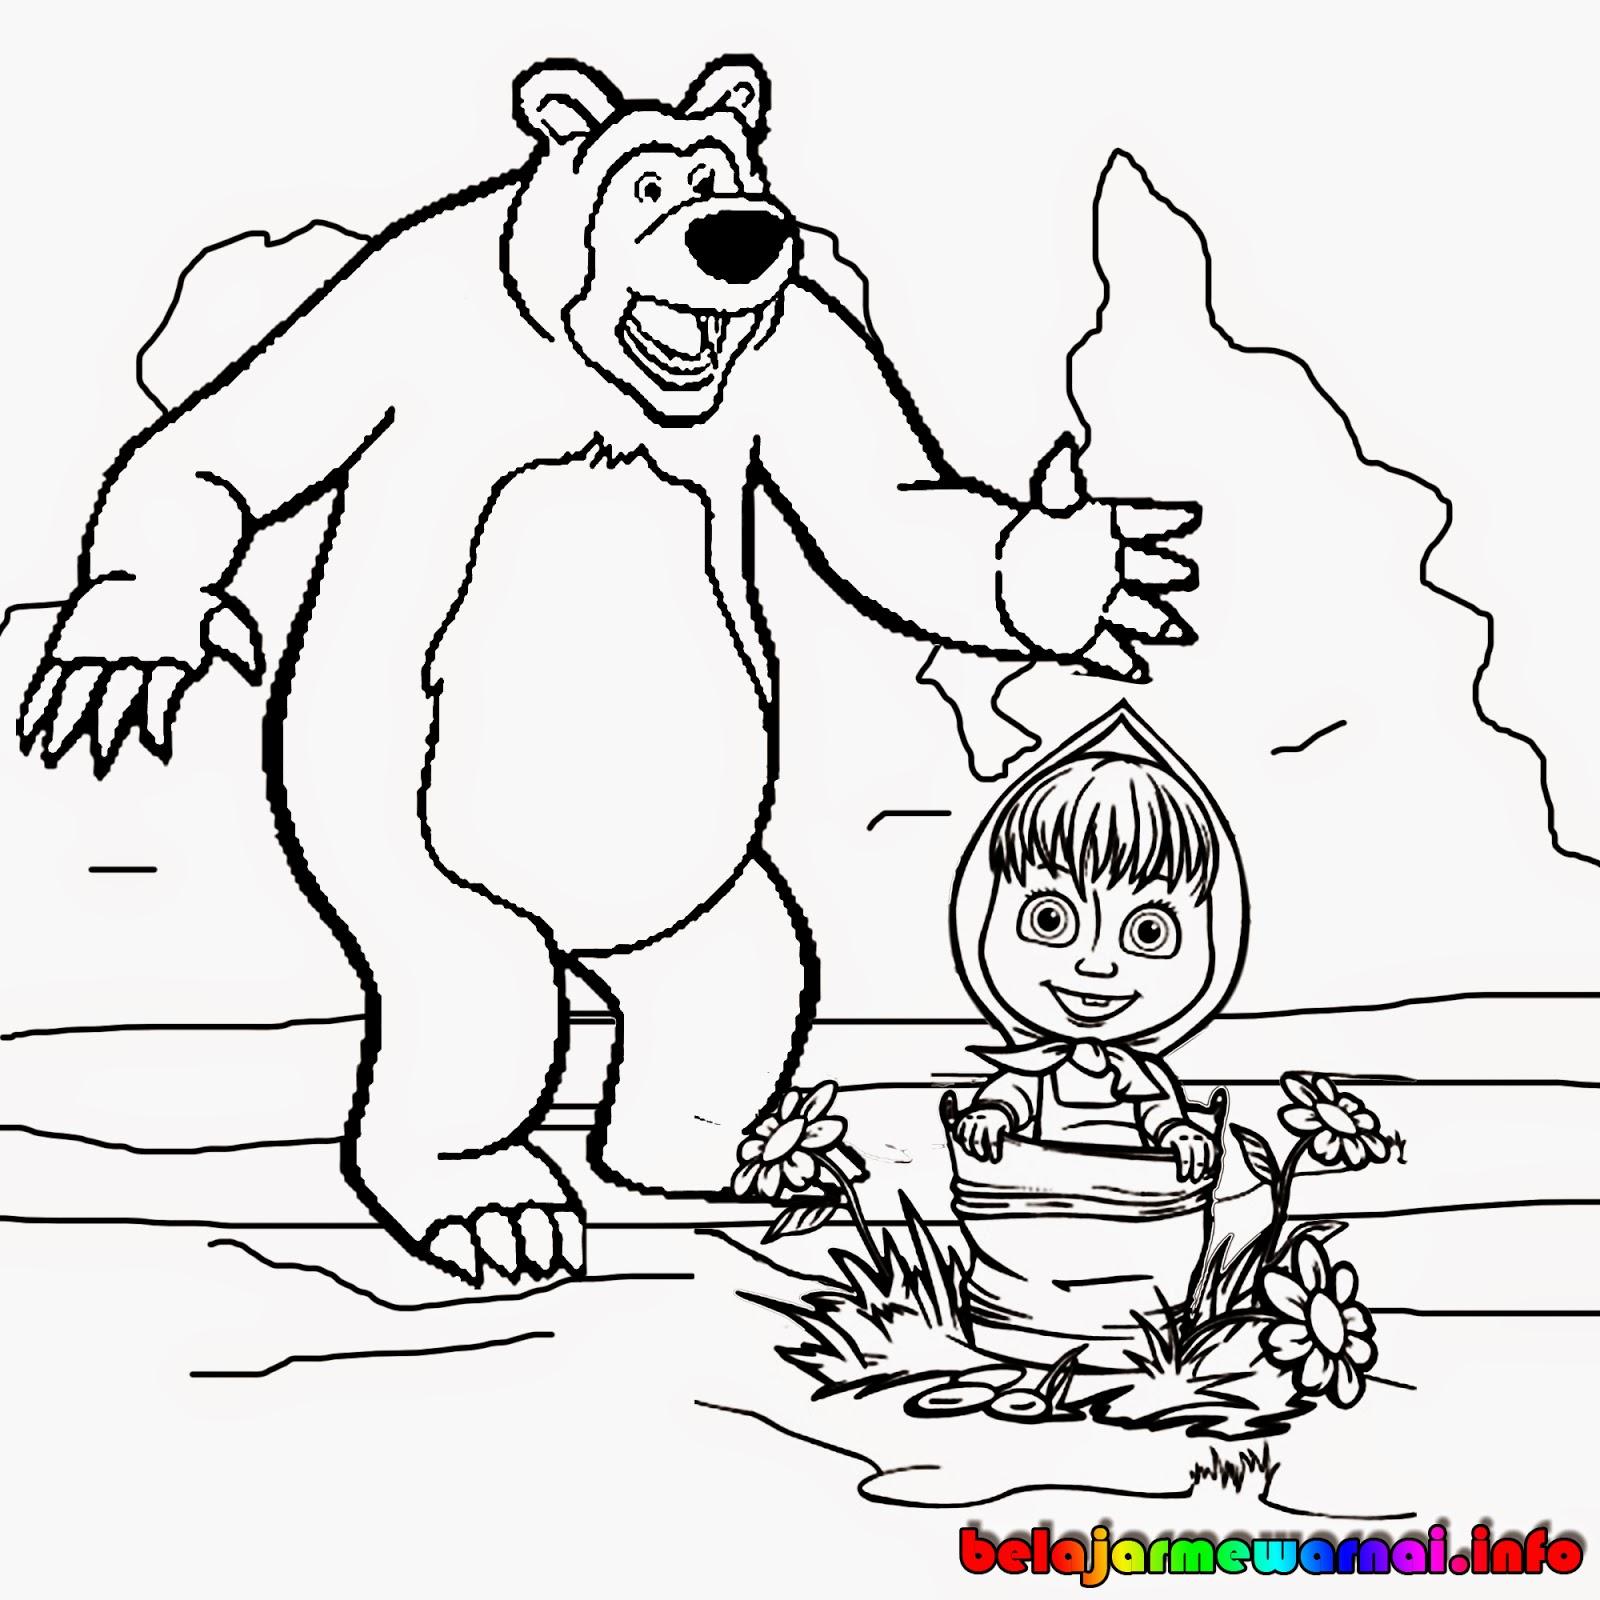 Gambar Mewarnai Masha & The Bear Gambar Mewarnai Lucu